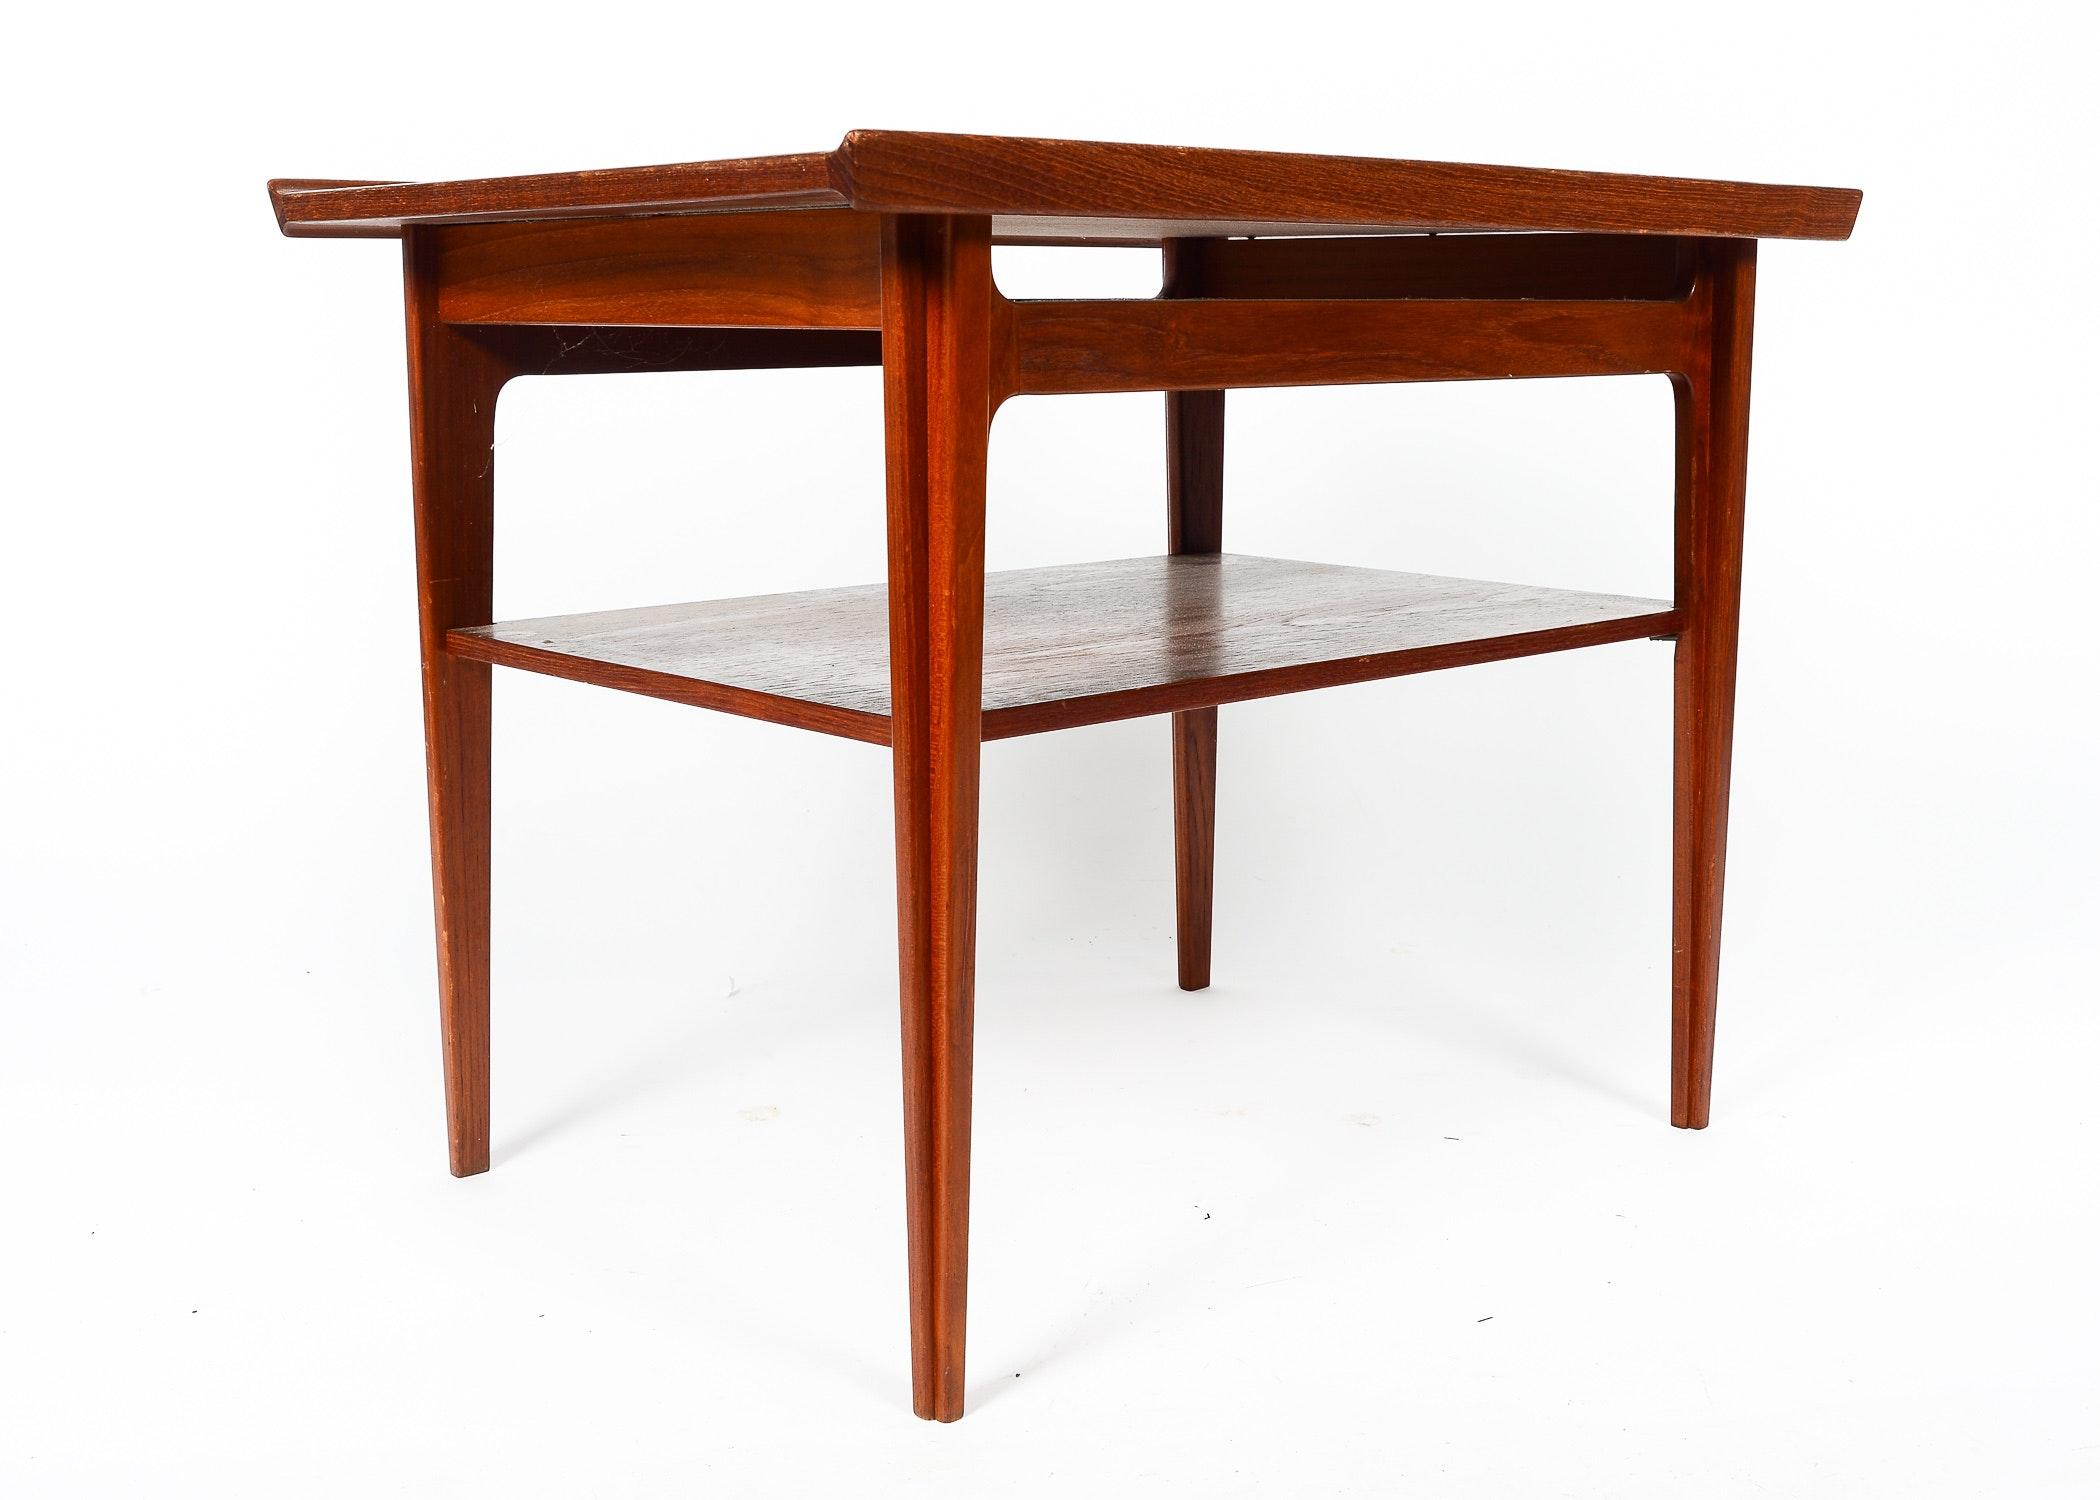 Modern Furniture Auction online furniture auctions   vintage furniture auction   antique